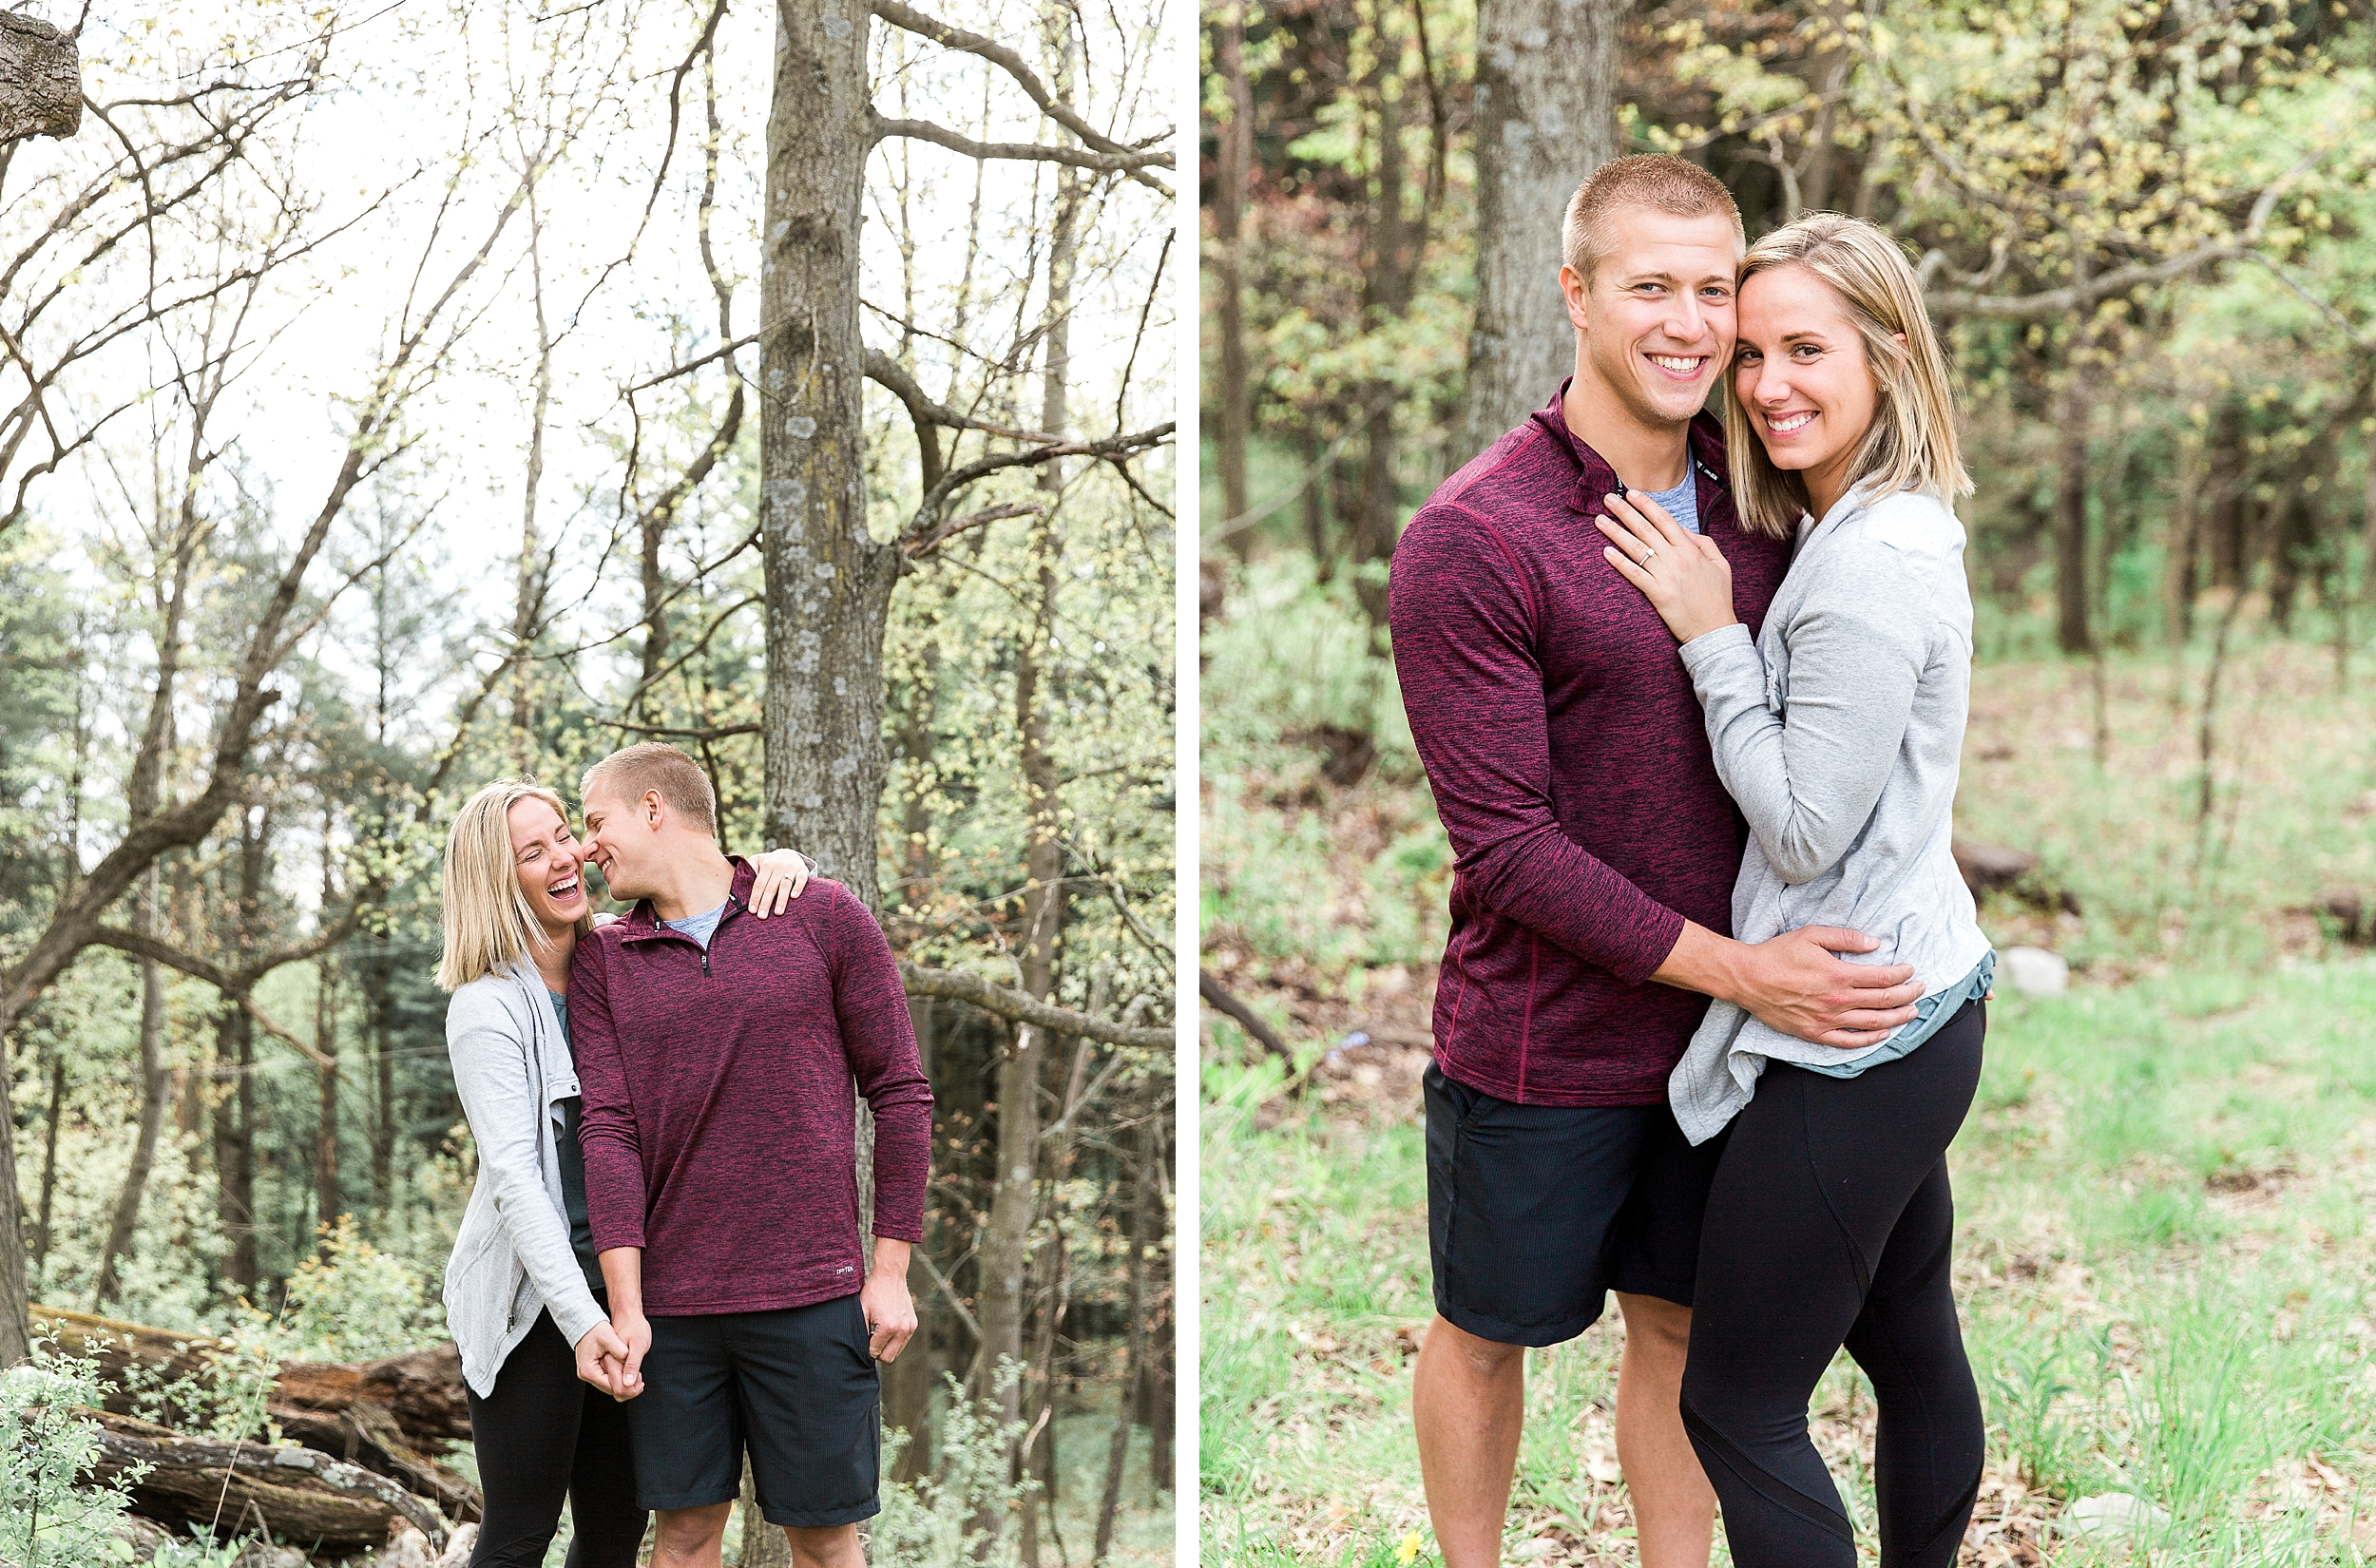 Courtney+Kyle_Proposal_HaleyKingCo_87_web.jpg